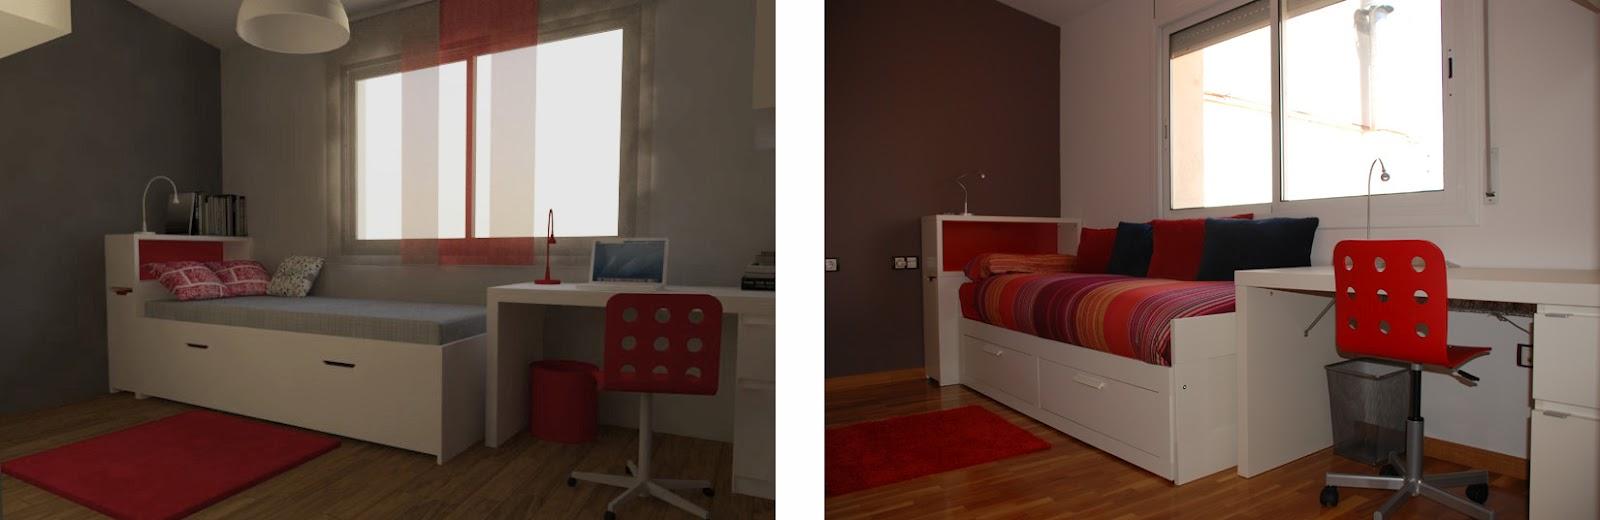 Estudio de arquitectura emearq abril 2012 - Cortinas ikea habitacion ...